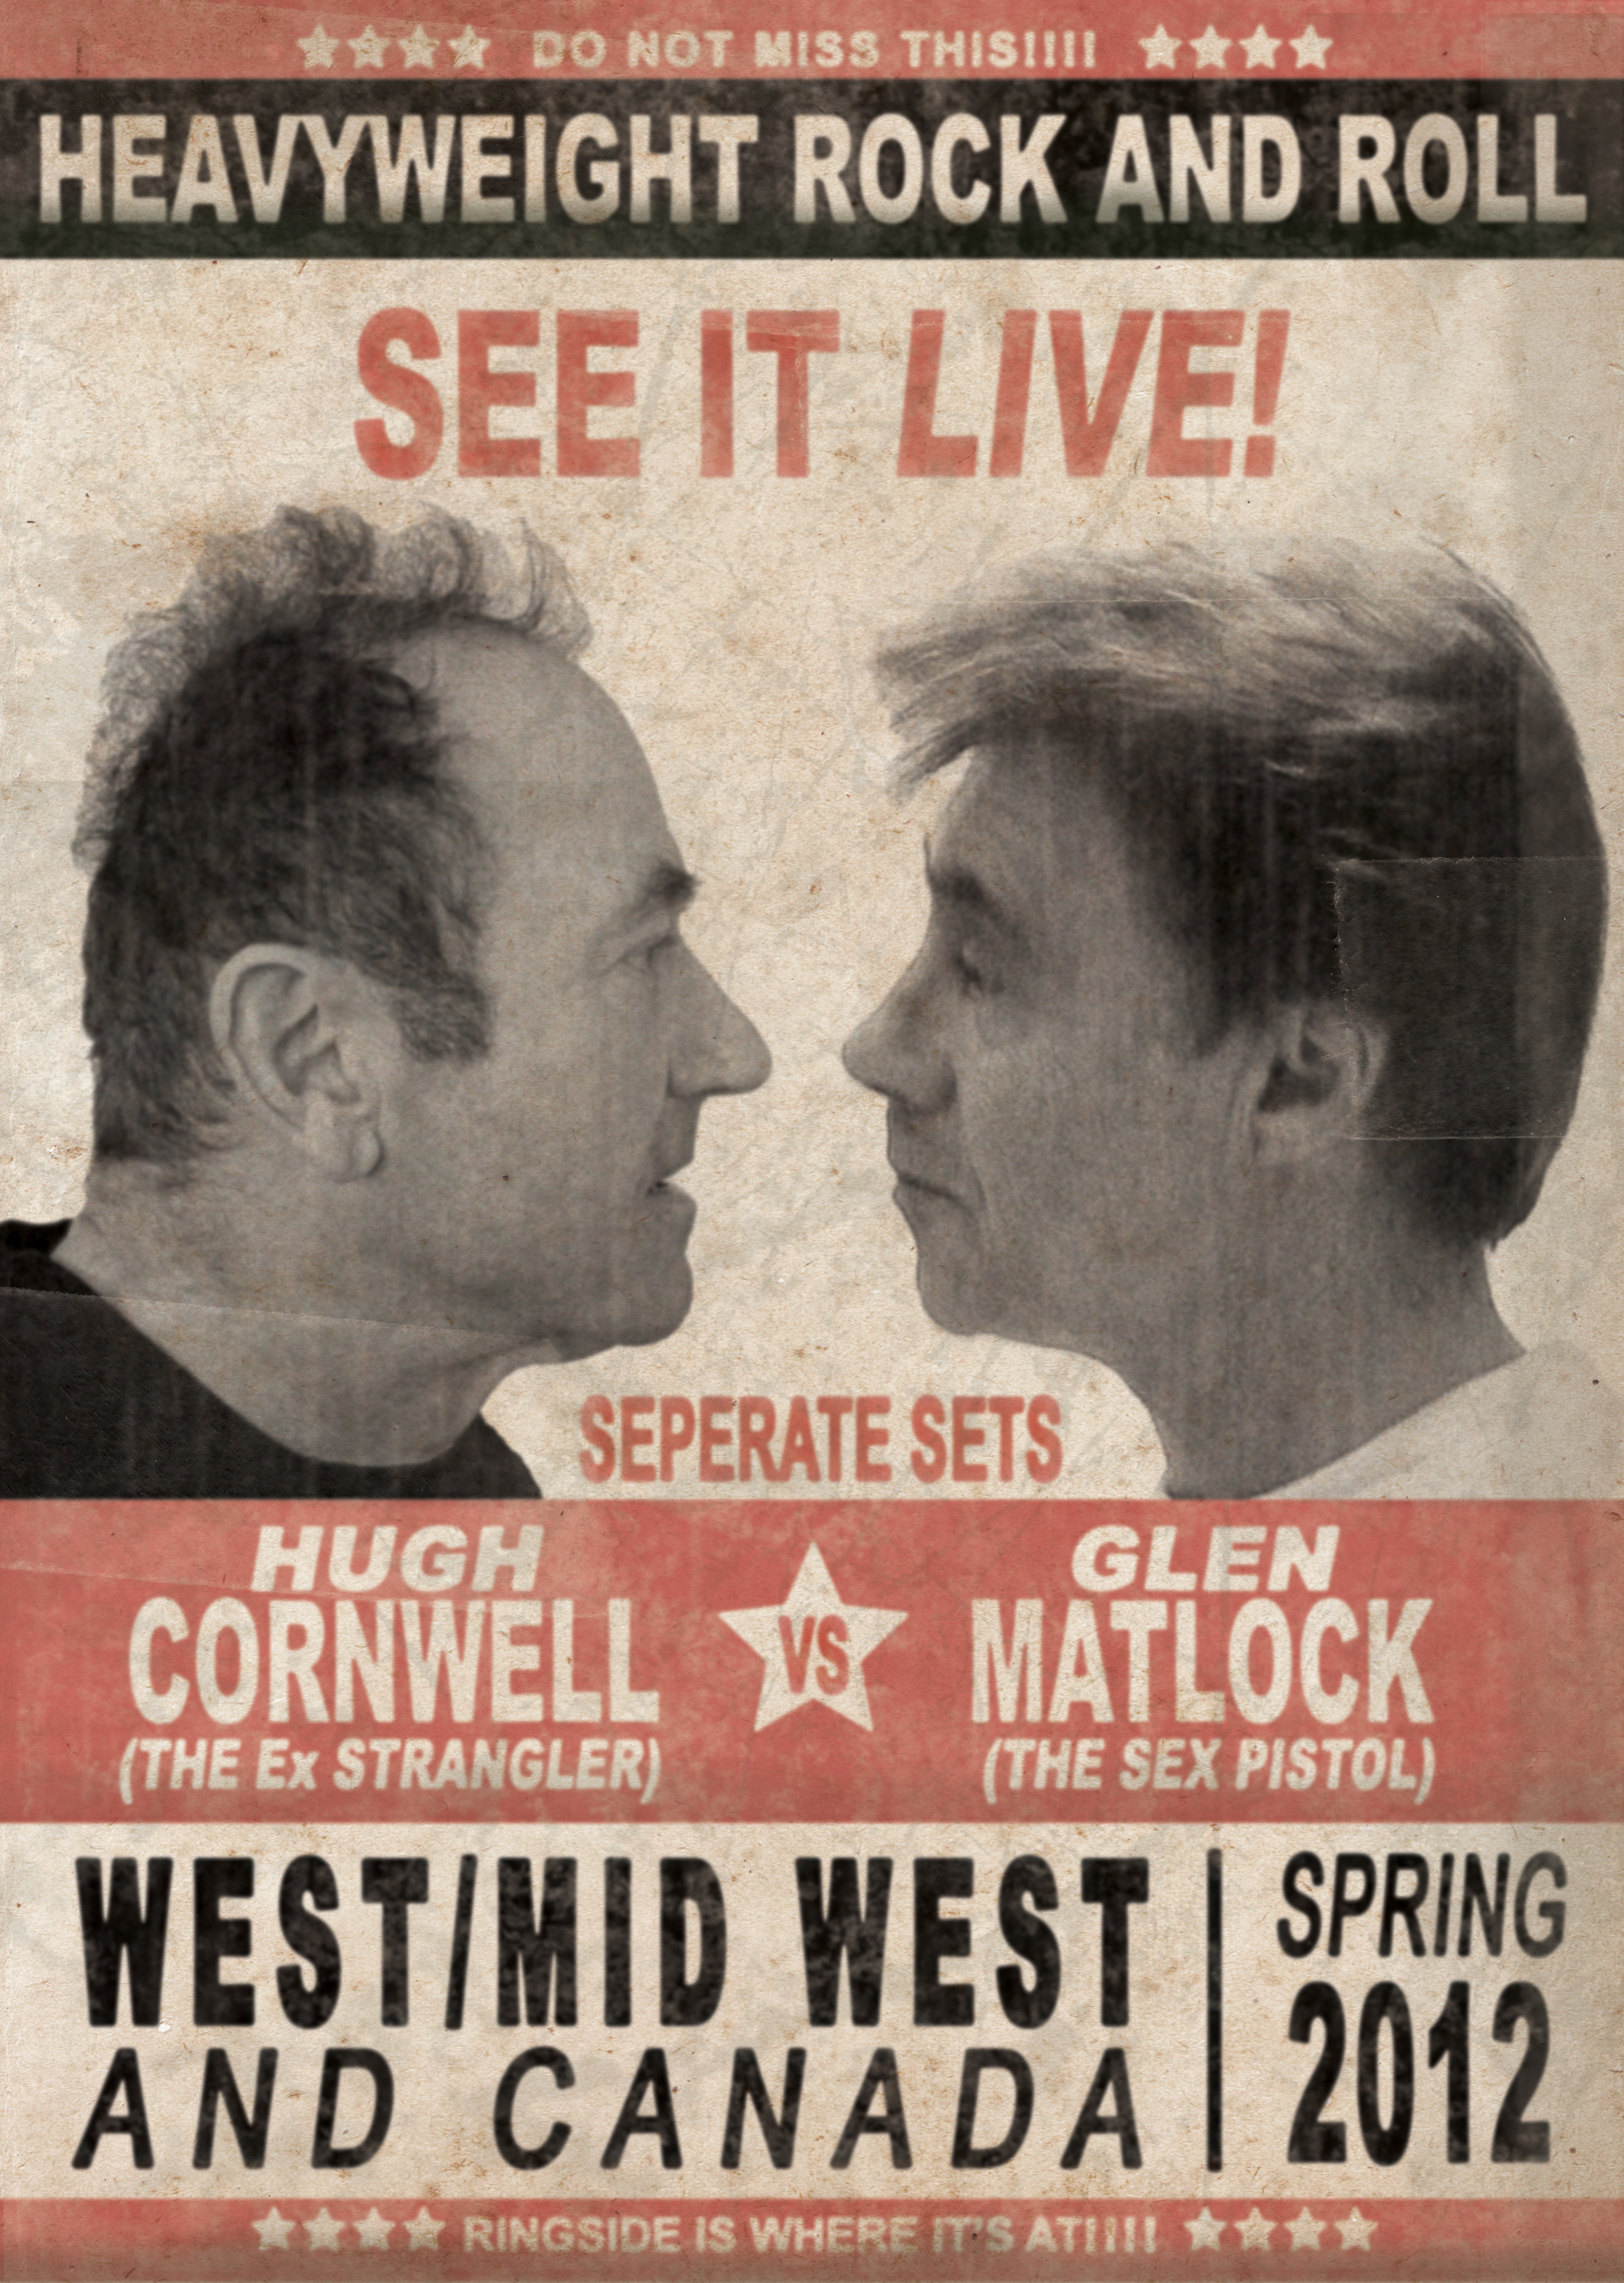 Hugh Cornwell/Glen Matlock